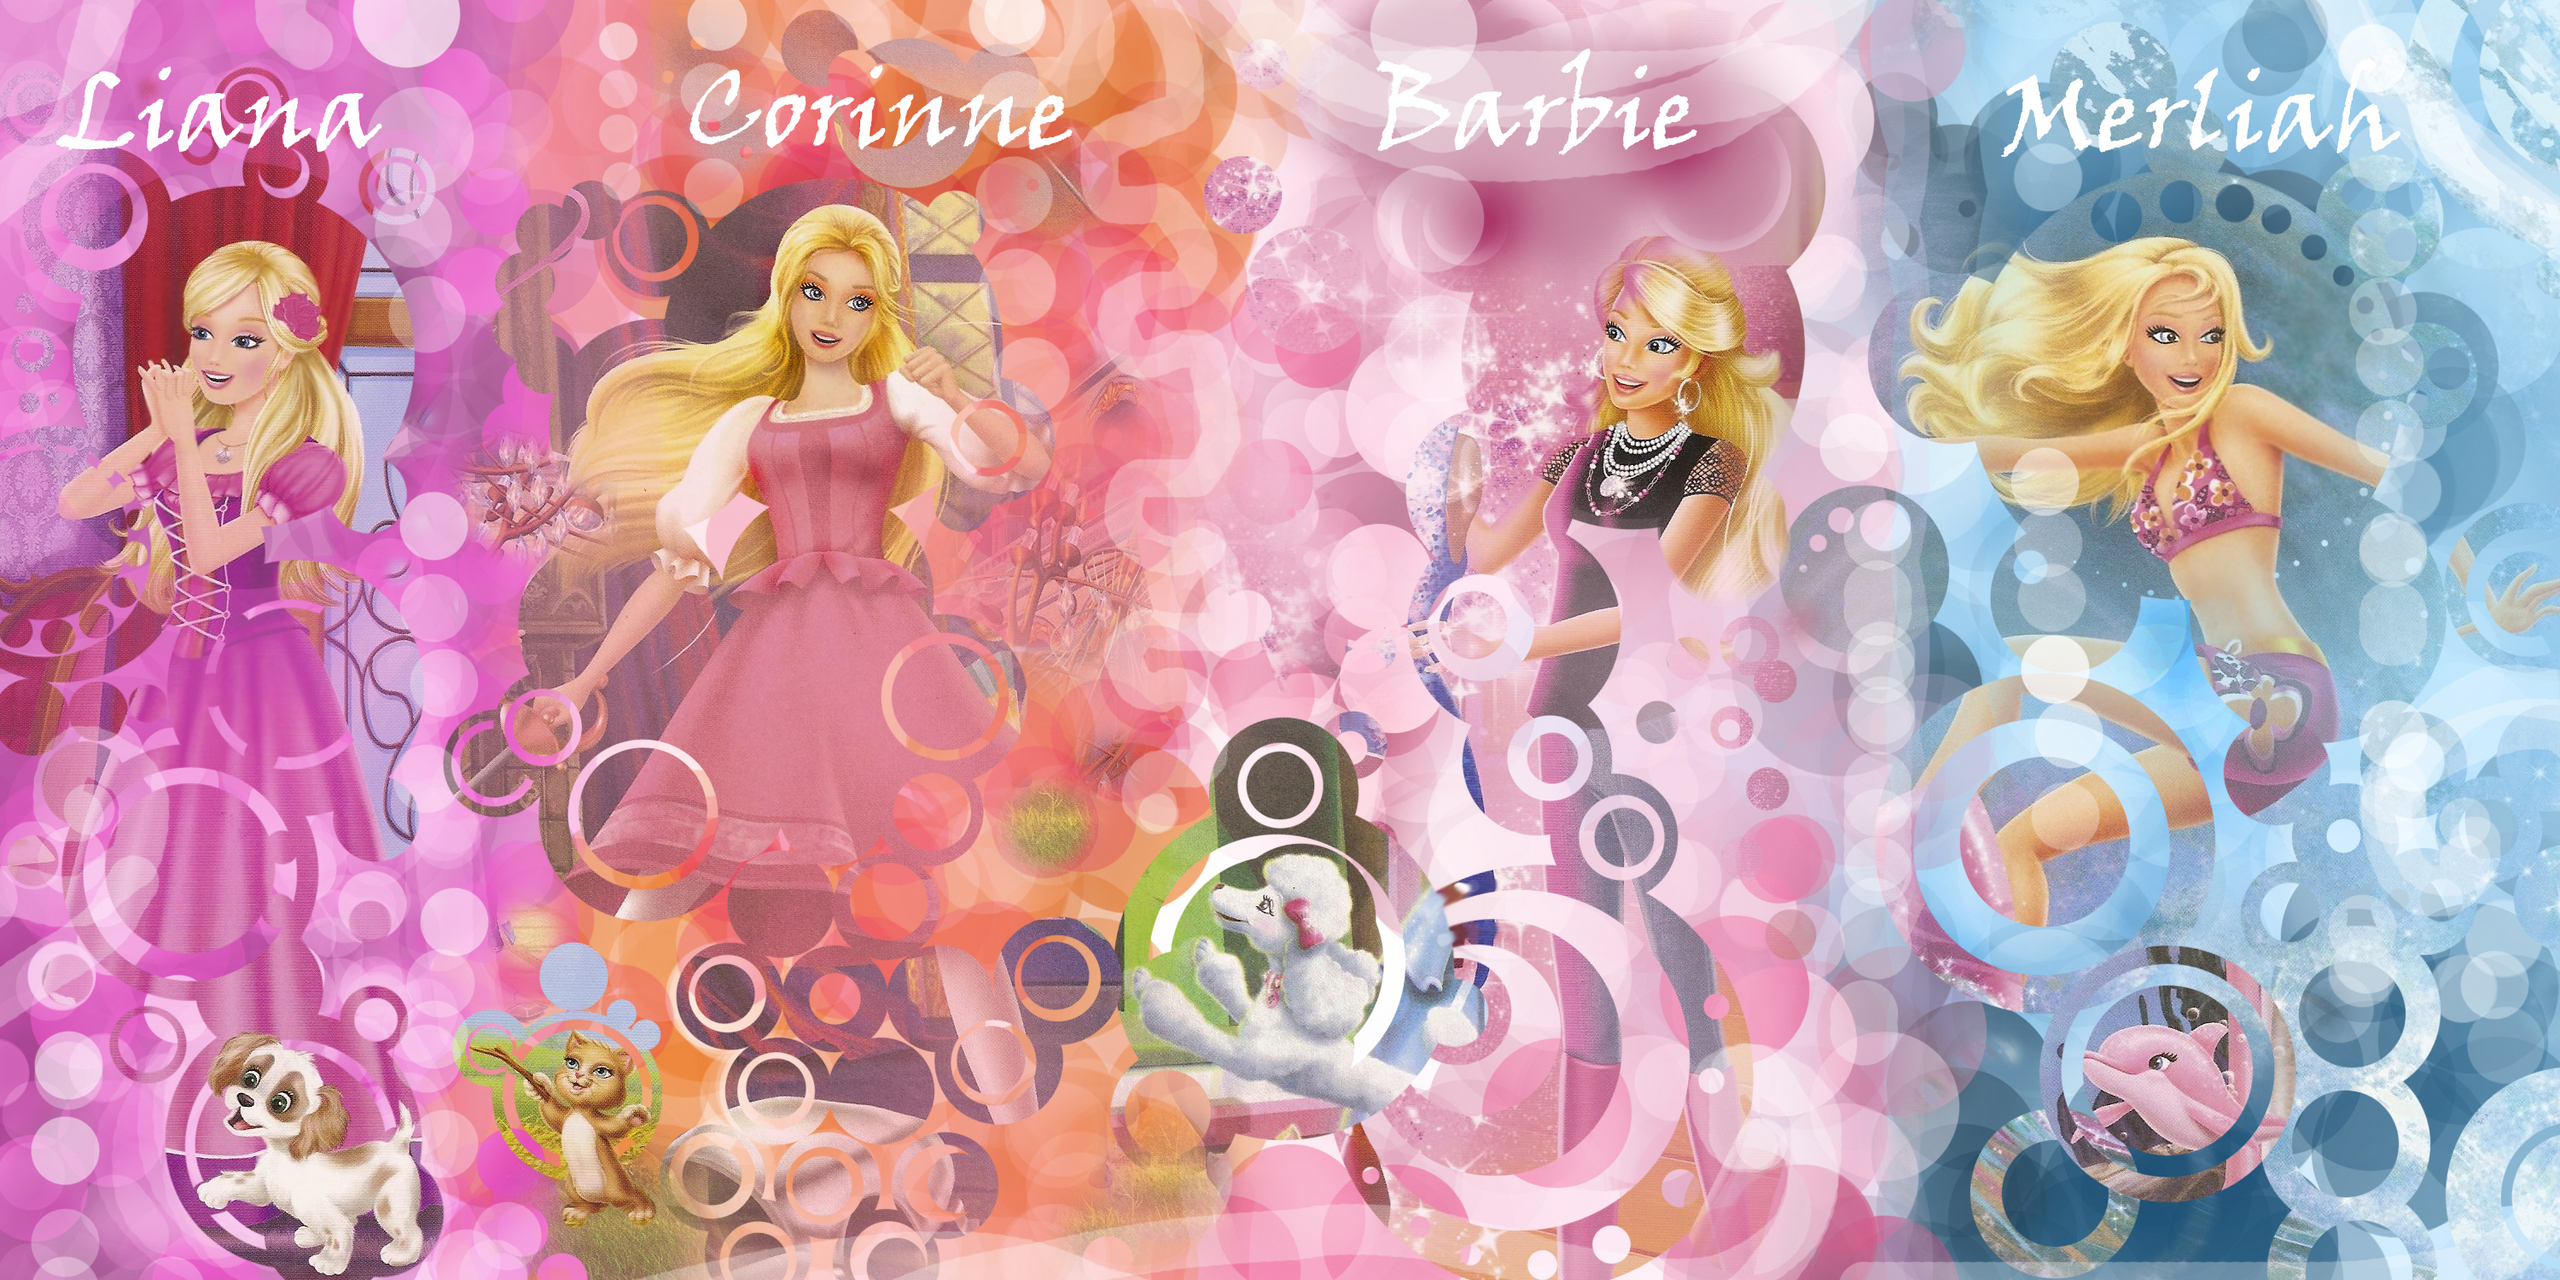 Barbie Movies Liana Corinne Barbie And Merliah